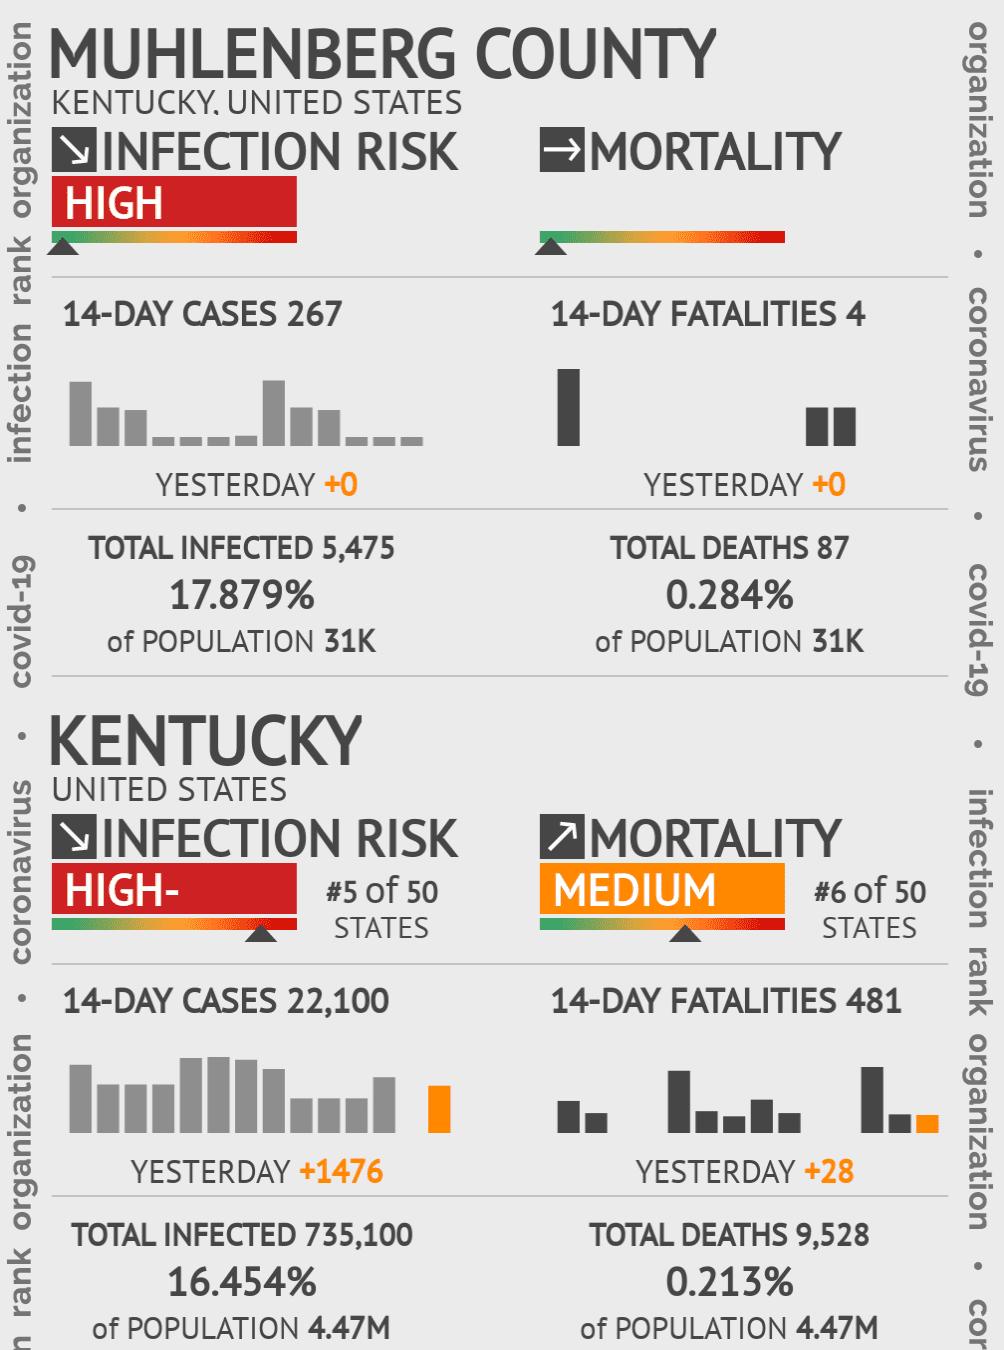 Muhlenberg County Coronavirus Covid-19 Risk of Infection on July 24, 2021